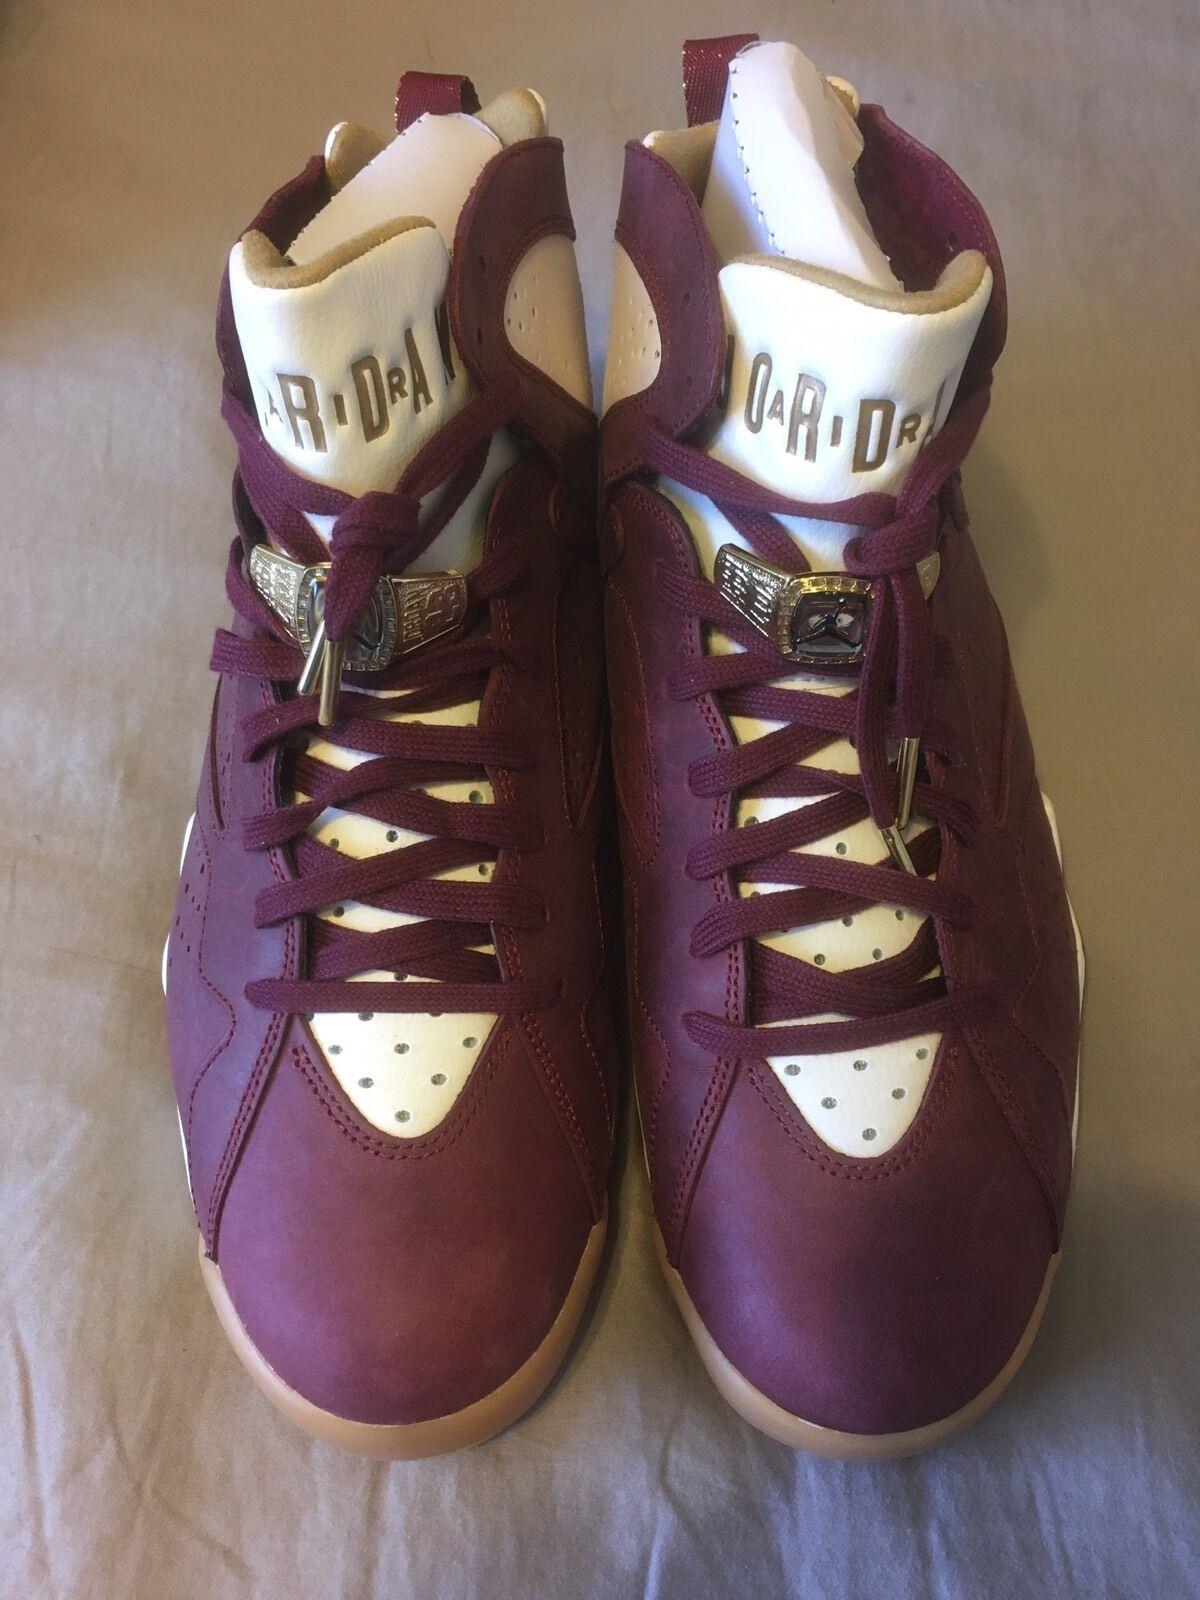 Nike Air Jordan 7 VII Retro (Cigar) - Men's US12 - 100% Authentic 725093-630